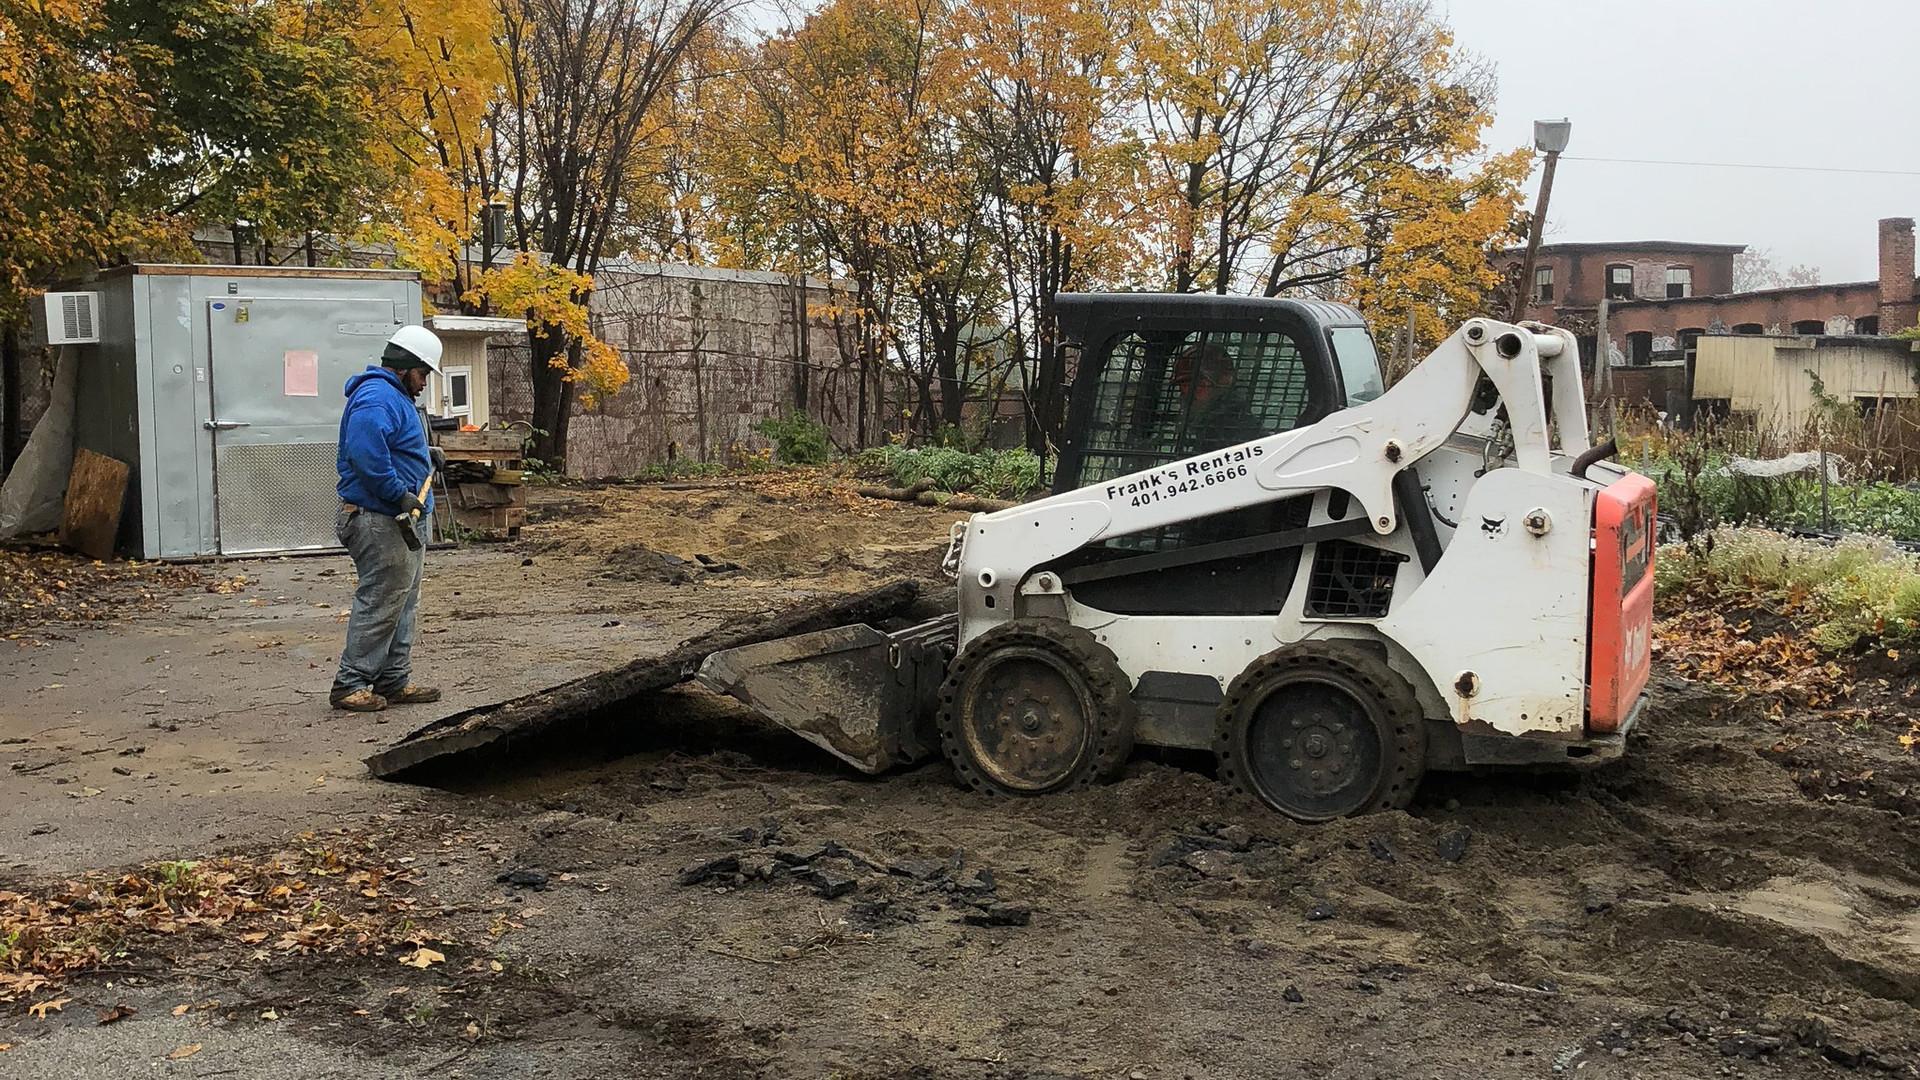 Removing asphalt